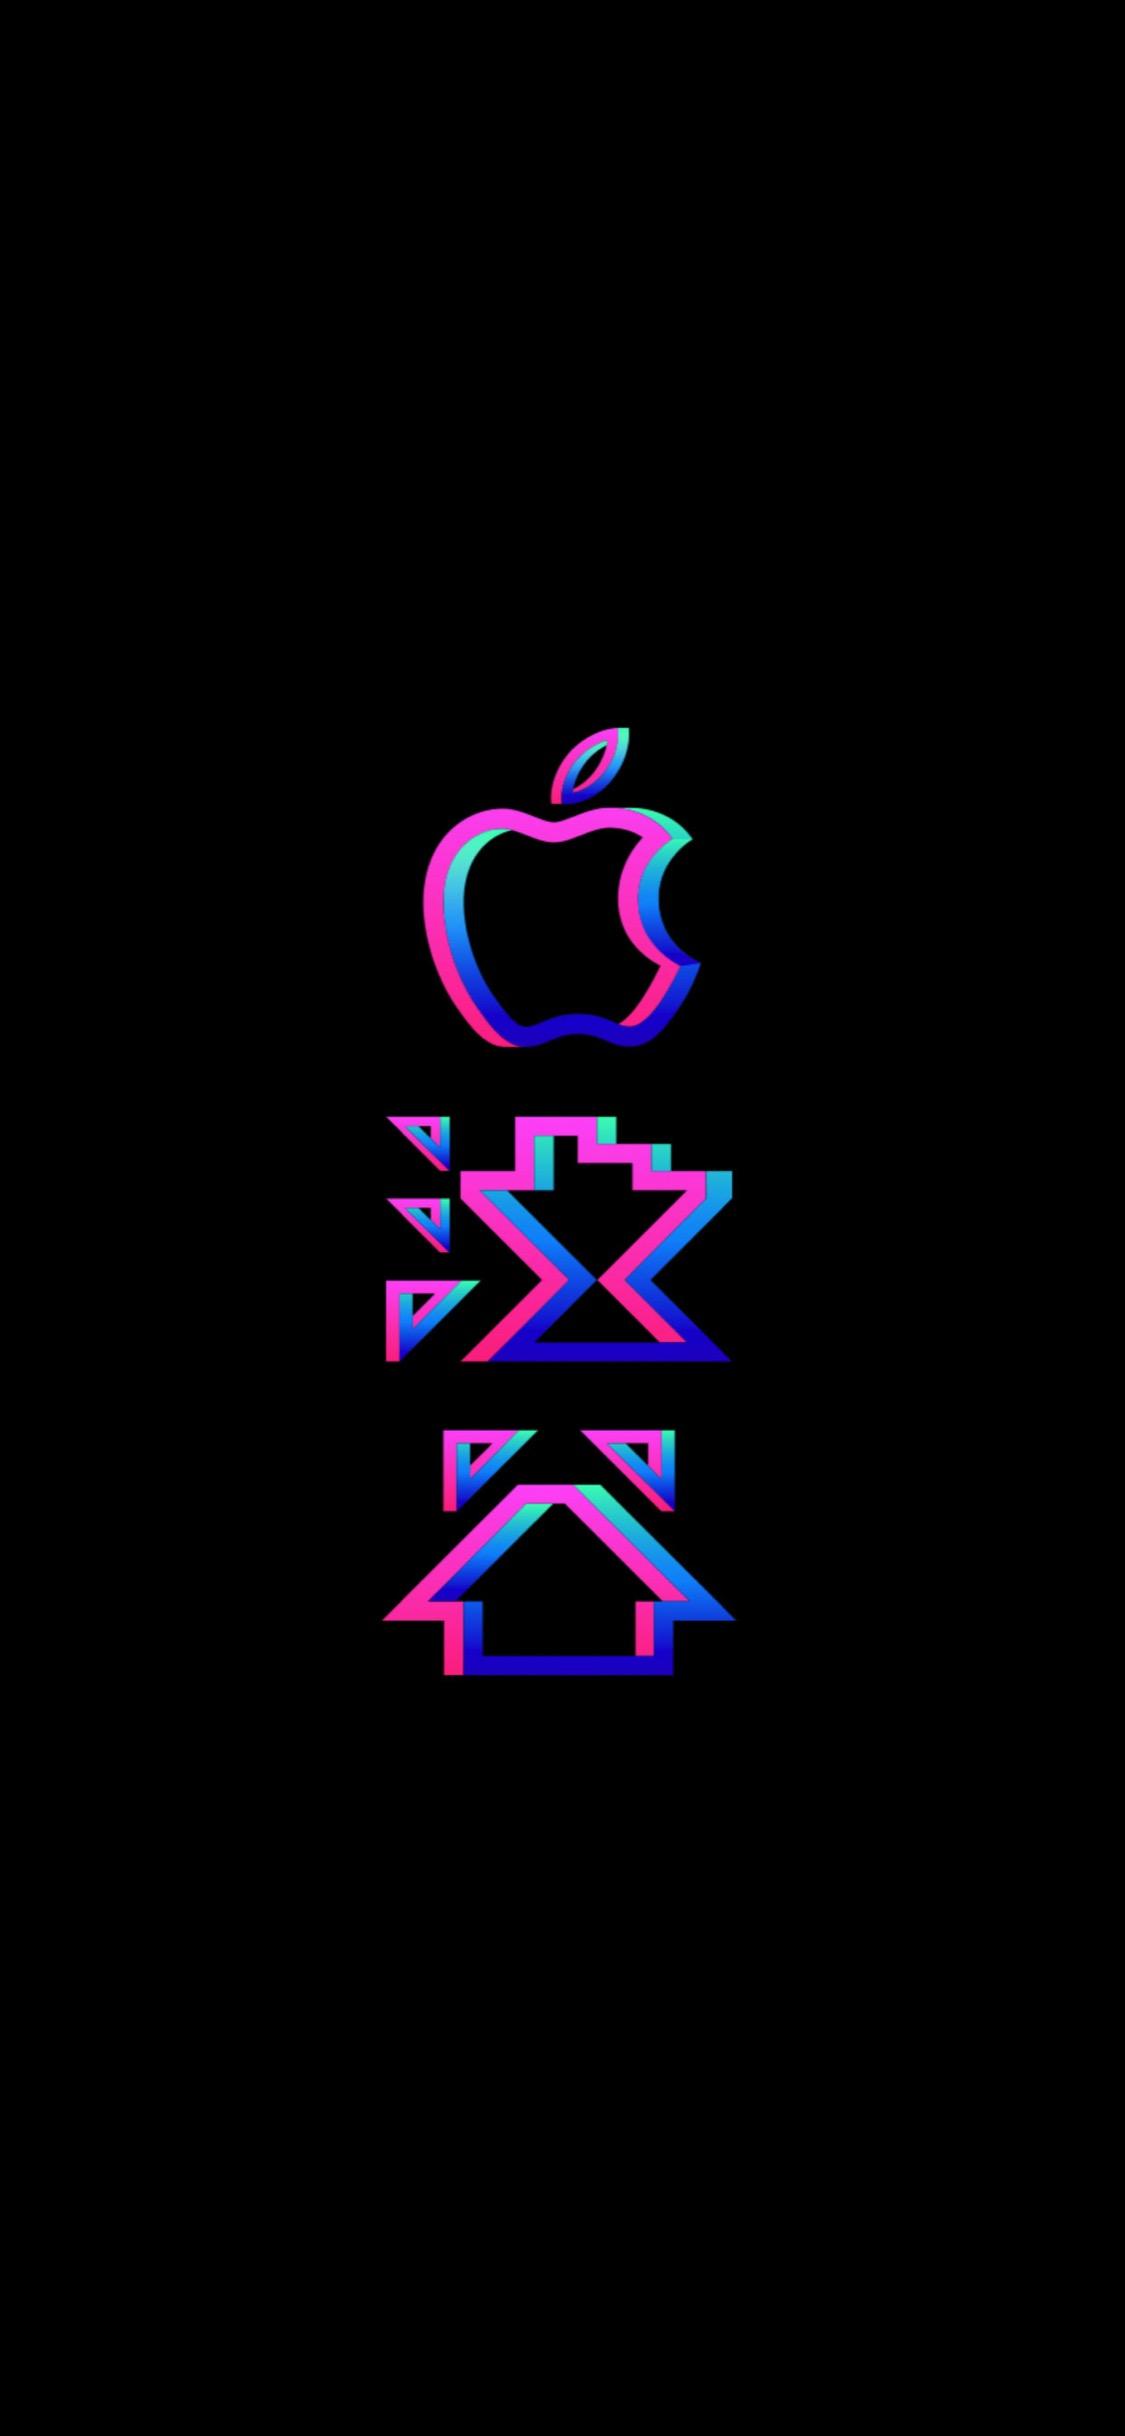 iPhone XS 壁紙 wallpaper 1097